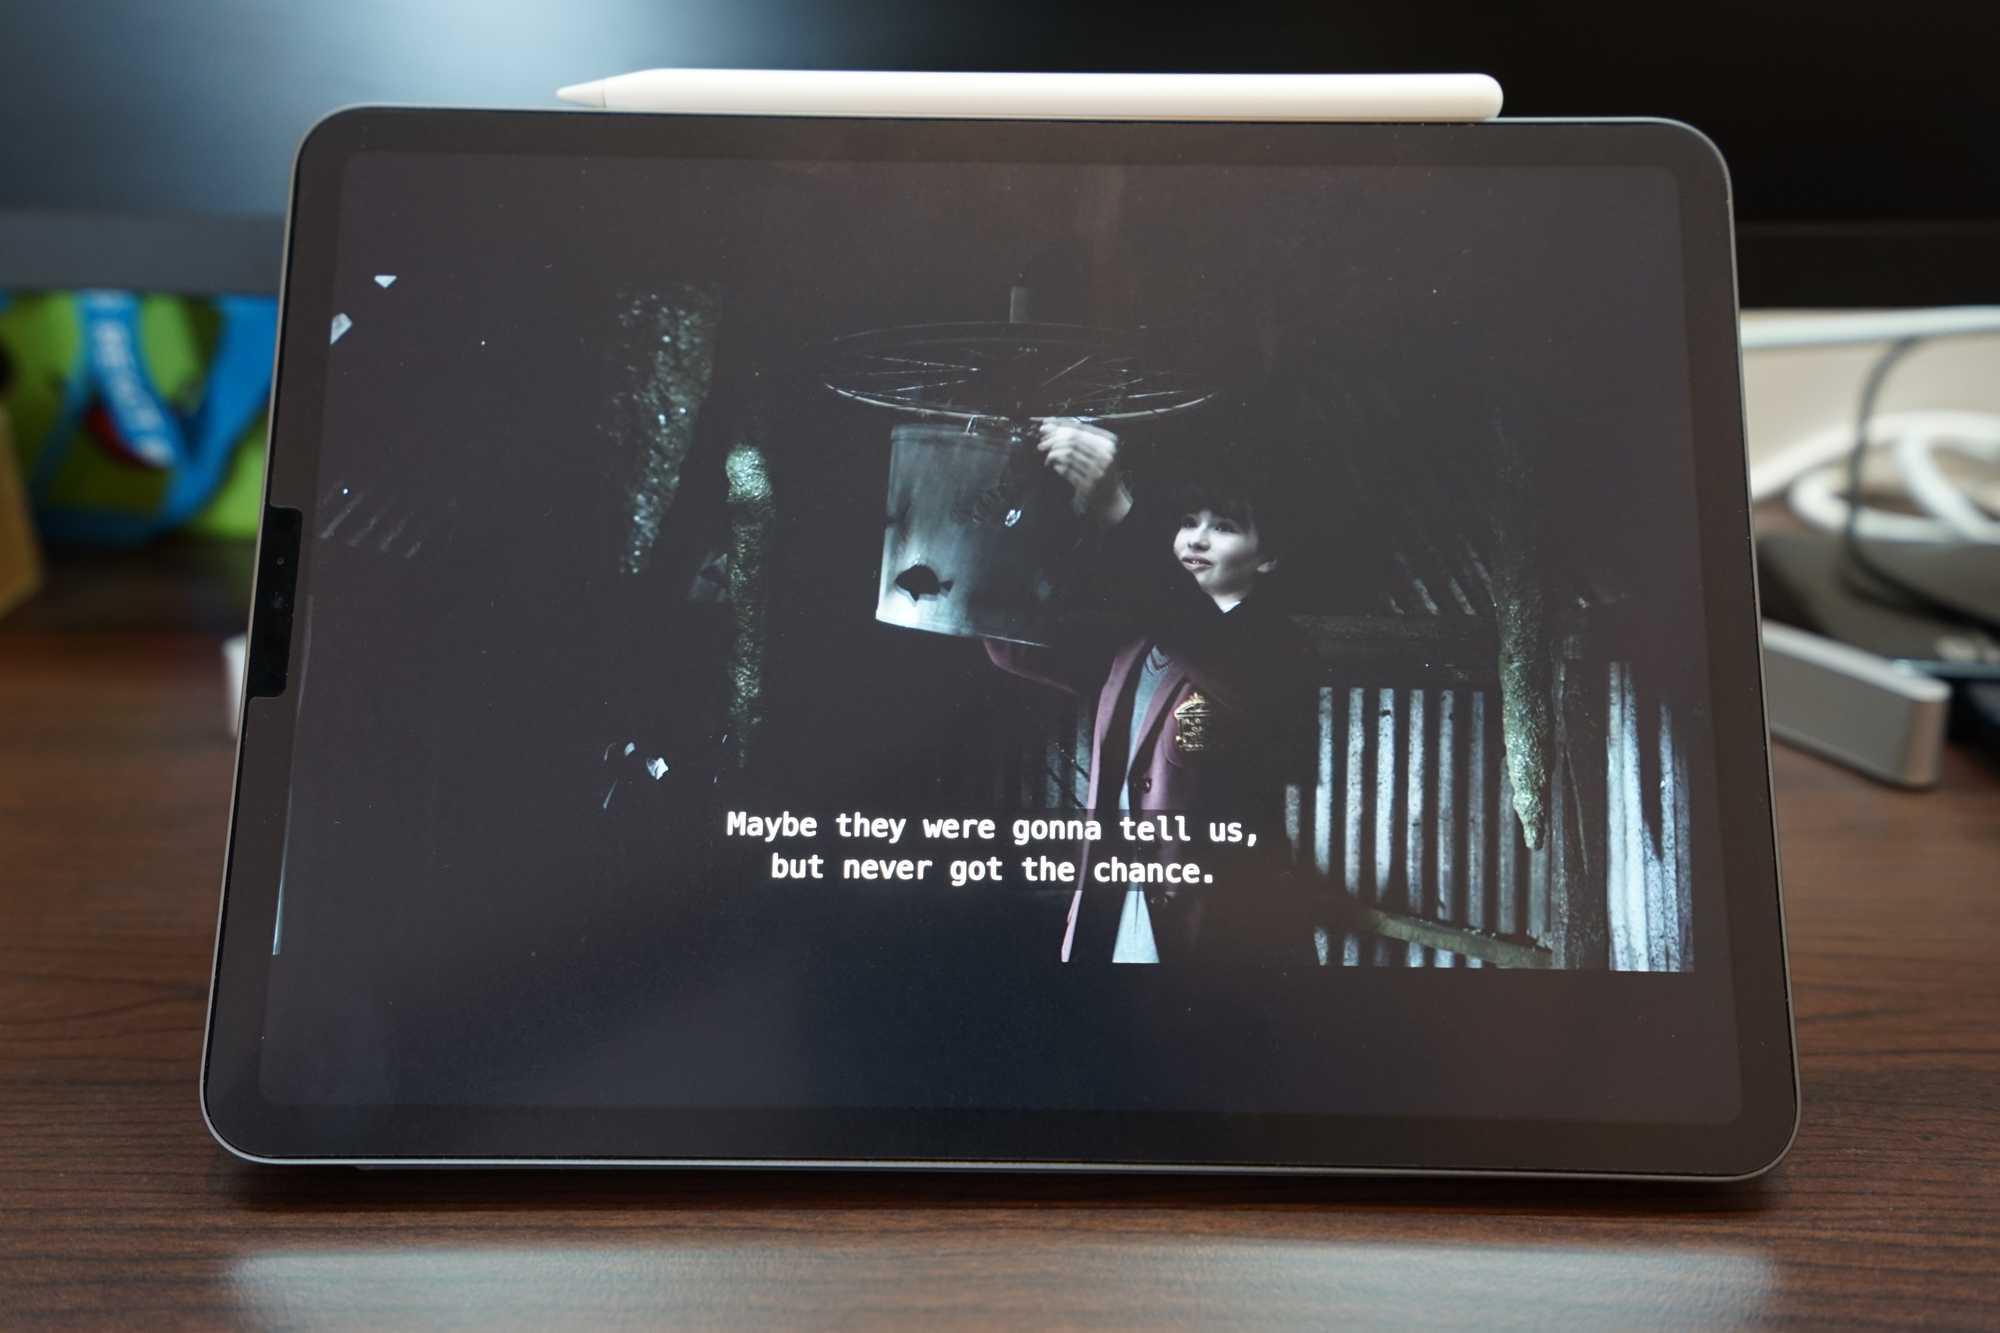 iPad Pro 11-inch with Netflix